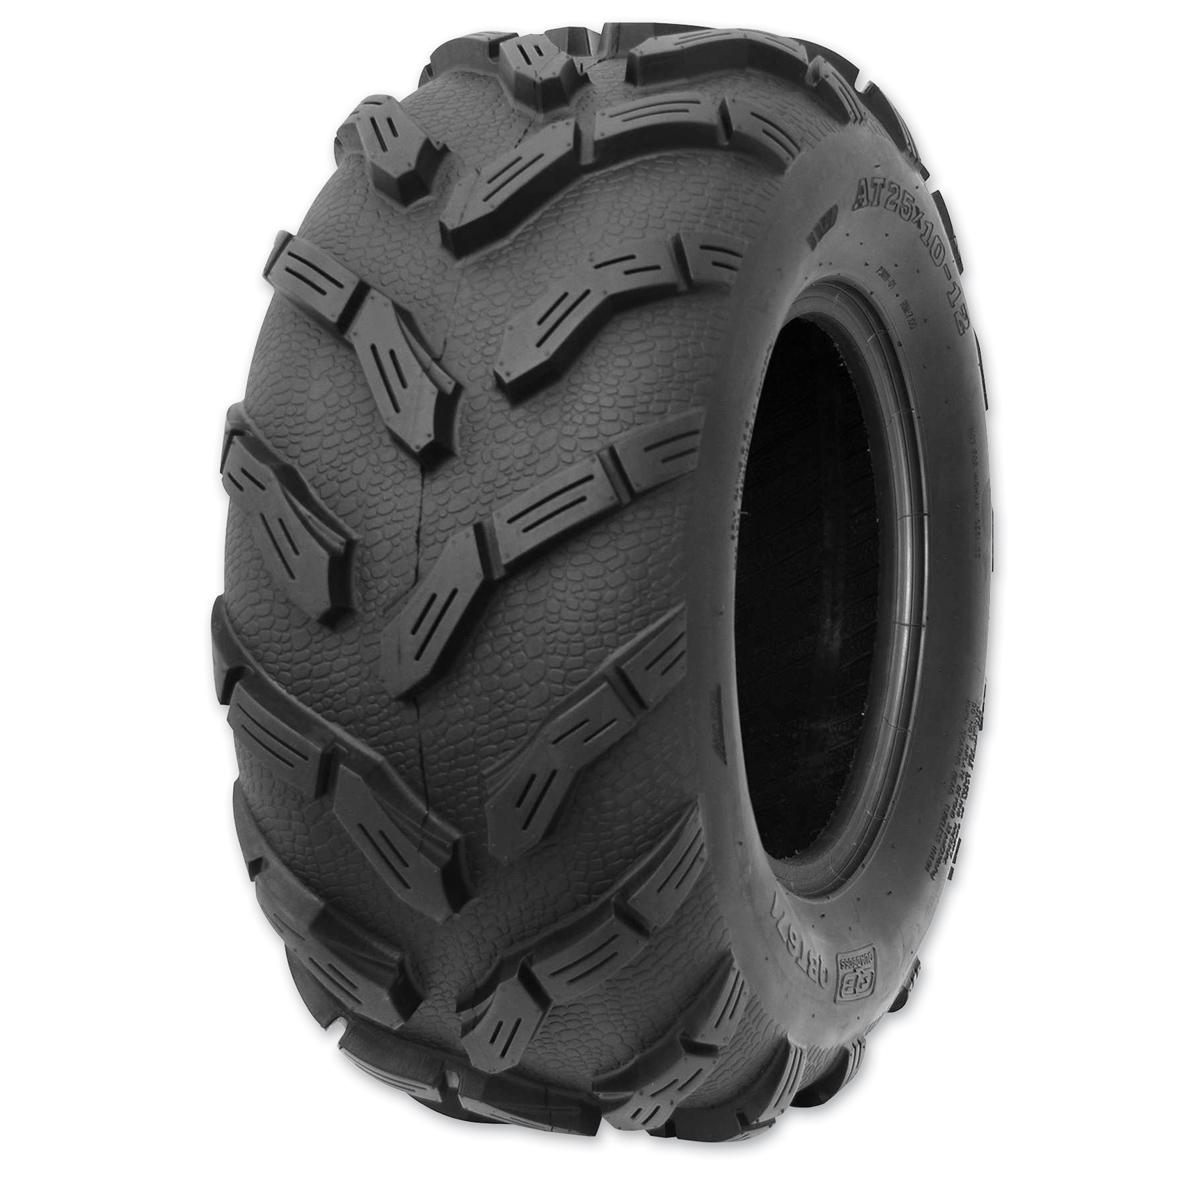 Quadboss  QBT671 27x12-12 6-Ply Rear Tire P3011-27X12-12